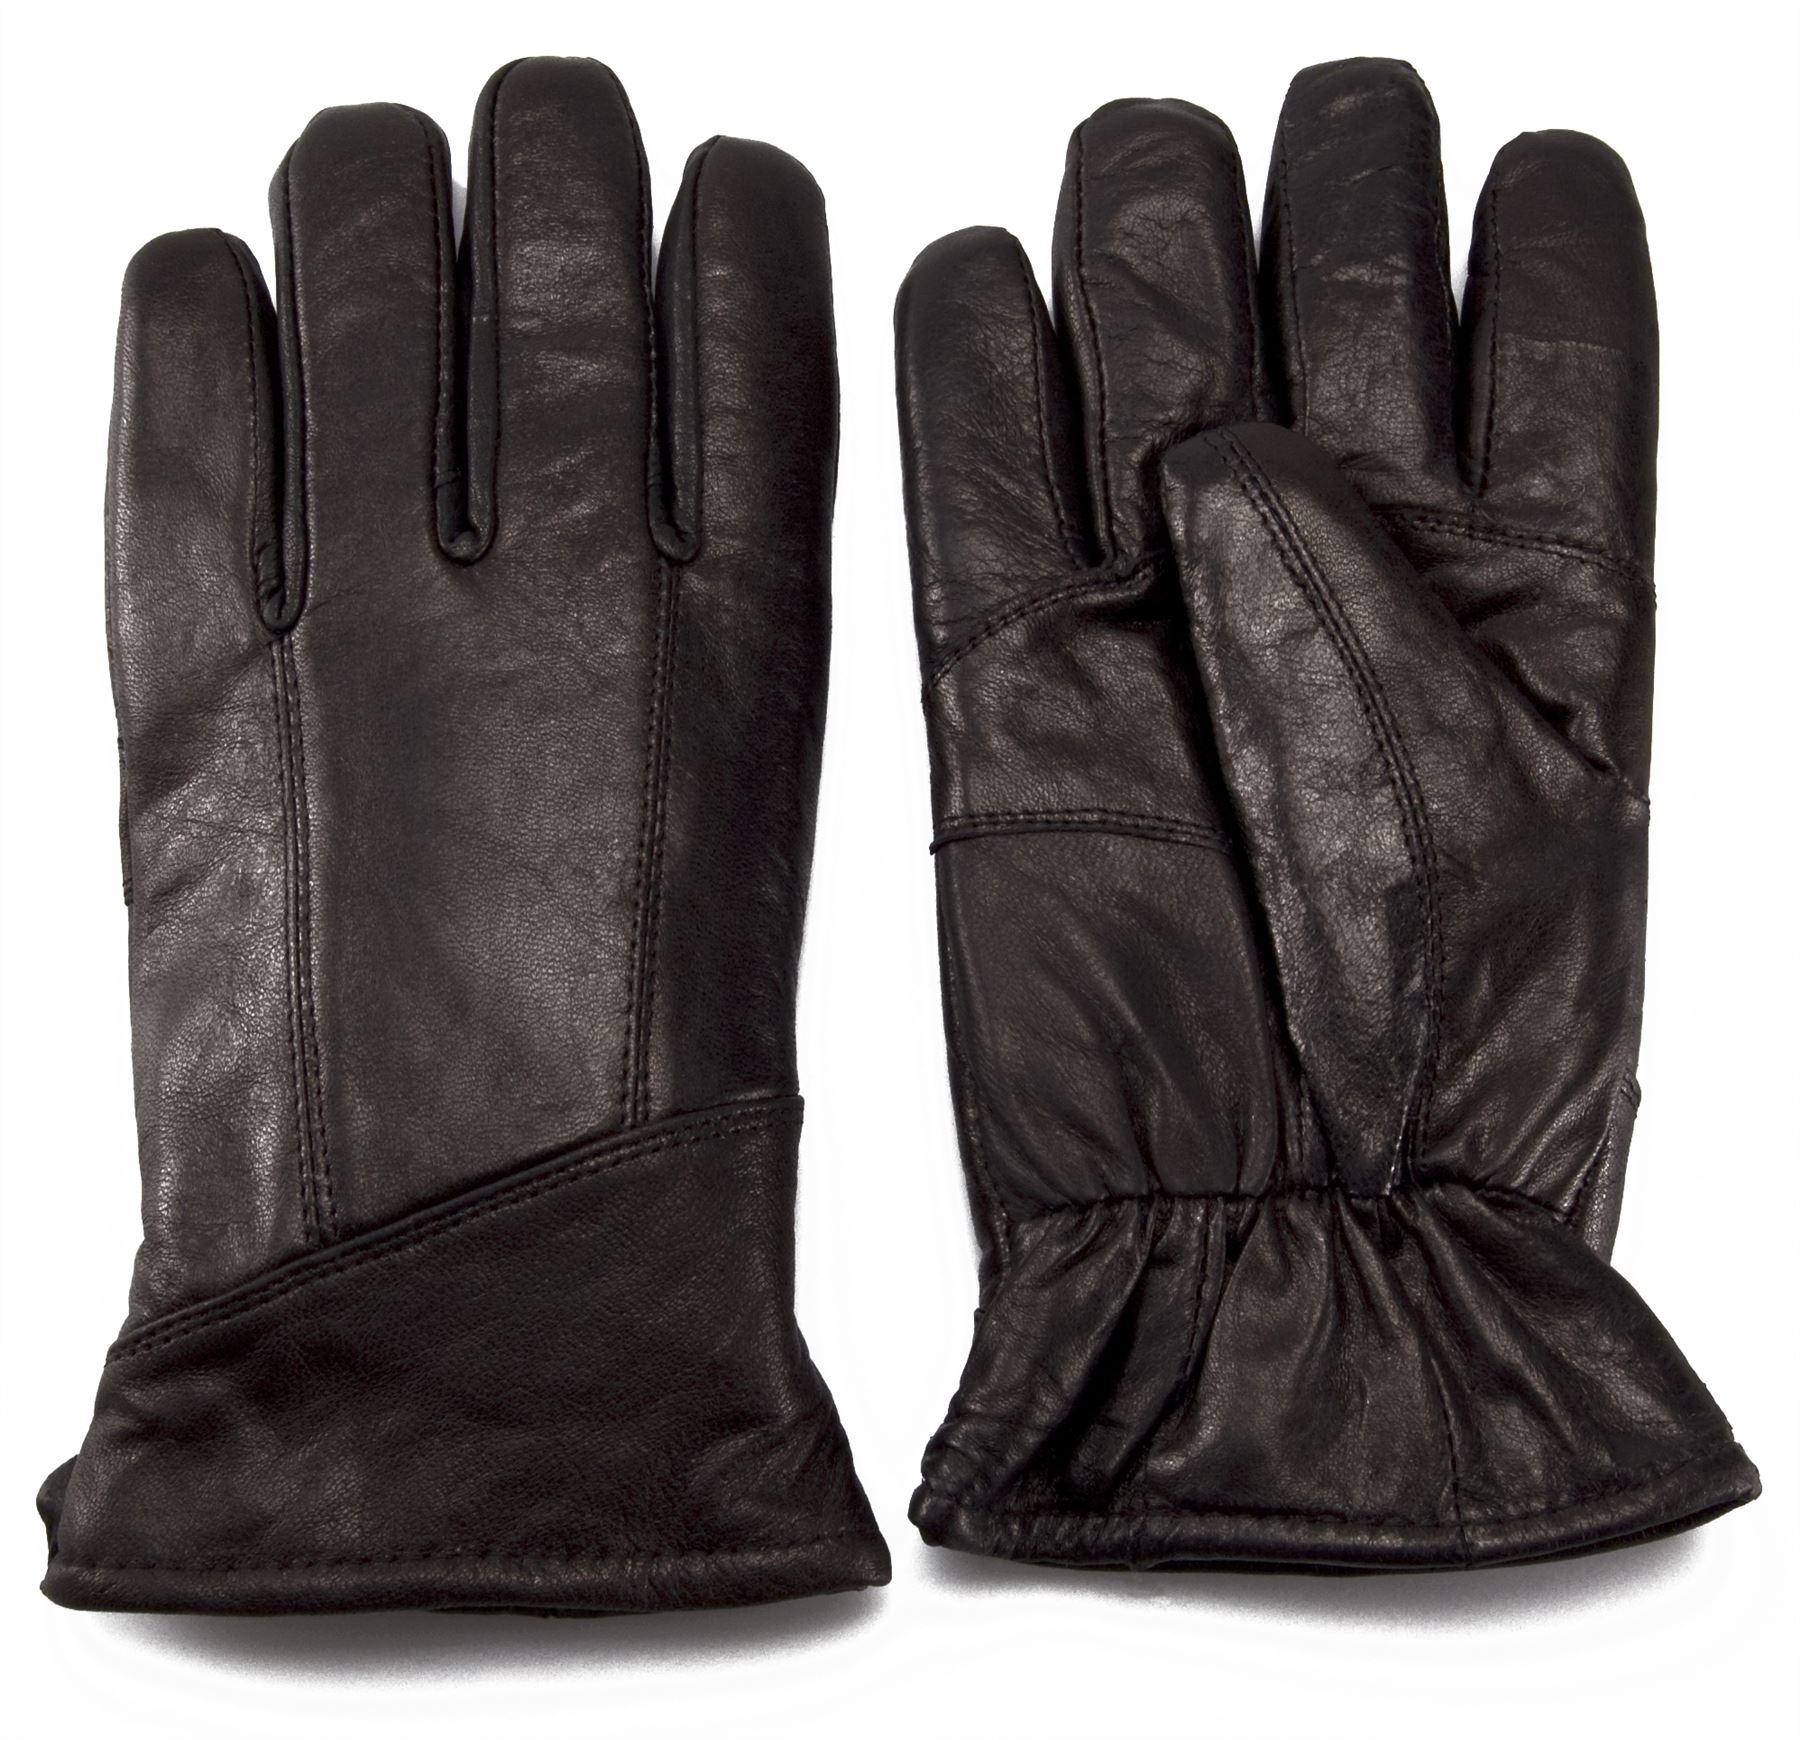 Mens sheepskin gloves uk - Nordvek Mens Sheepskin Lined Black Real Leather Gloves Genuine 302 100 Large